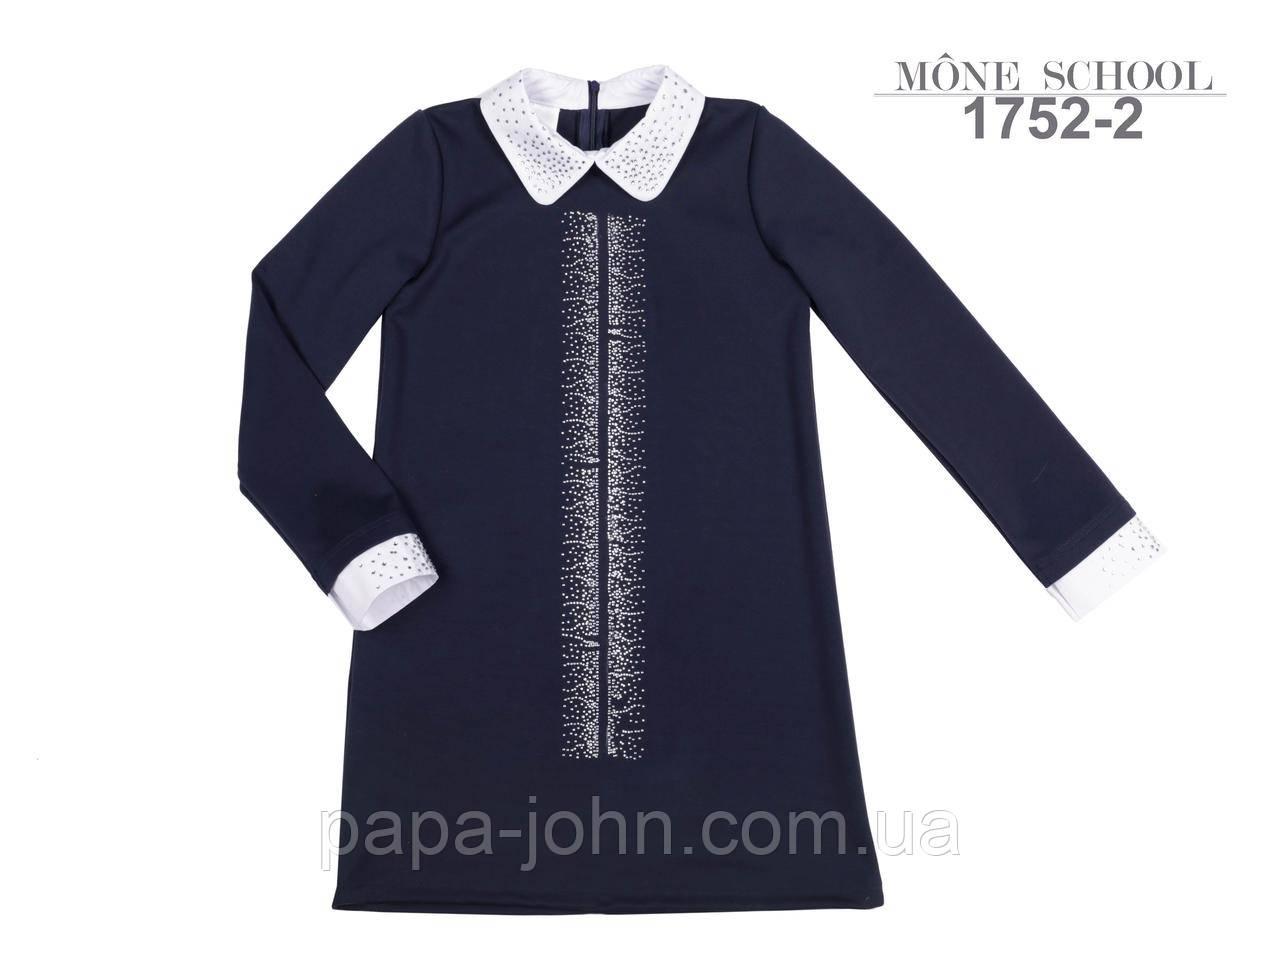 Платье трикотаж  декор стразы  ТМ Моне   р.140